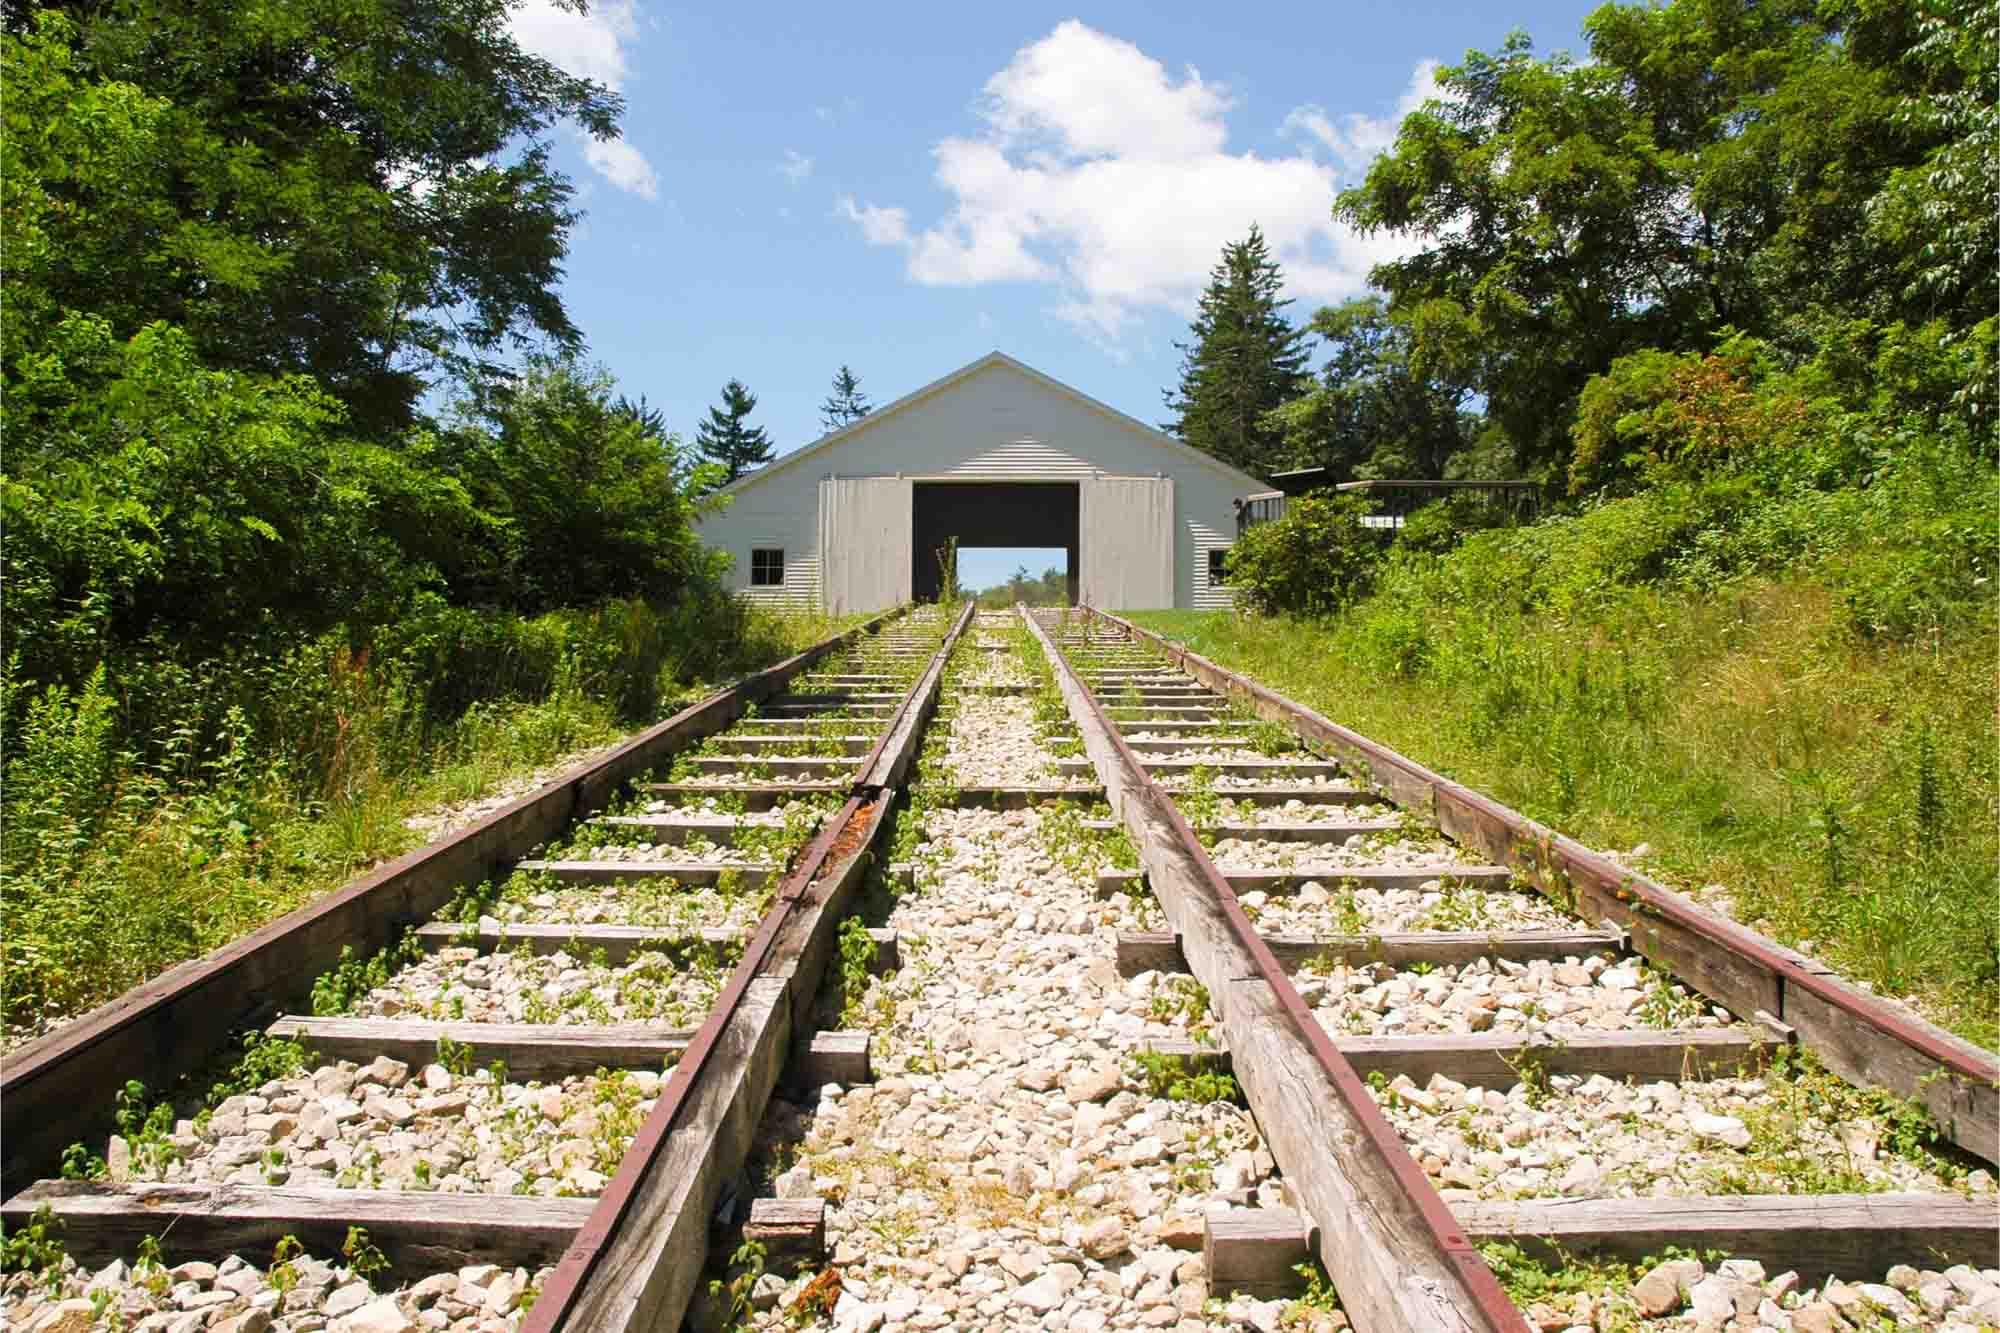 Railroad tracks leading to a barn